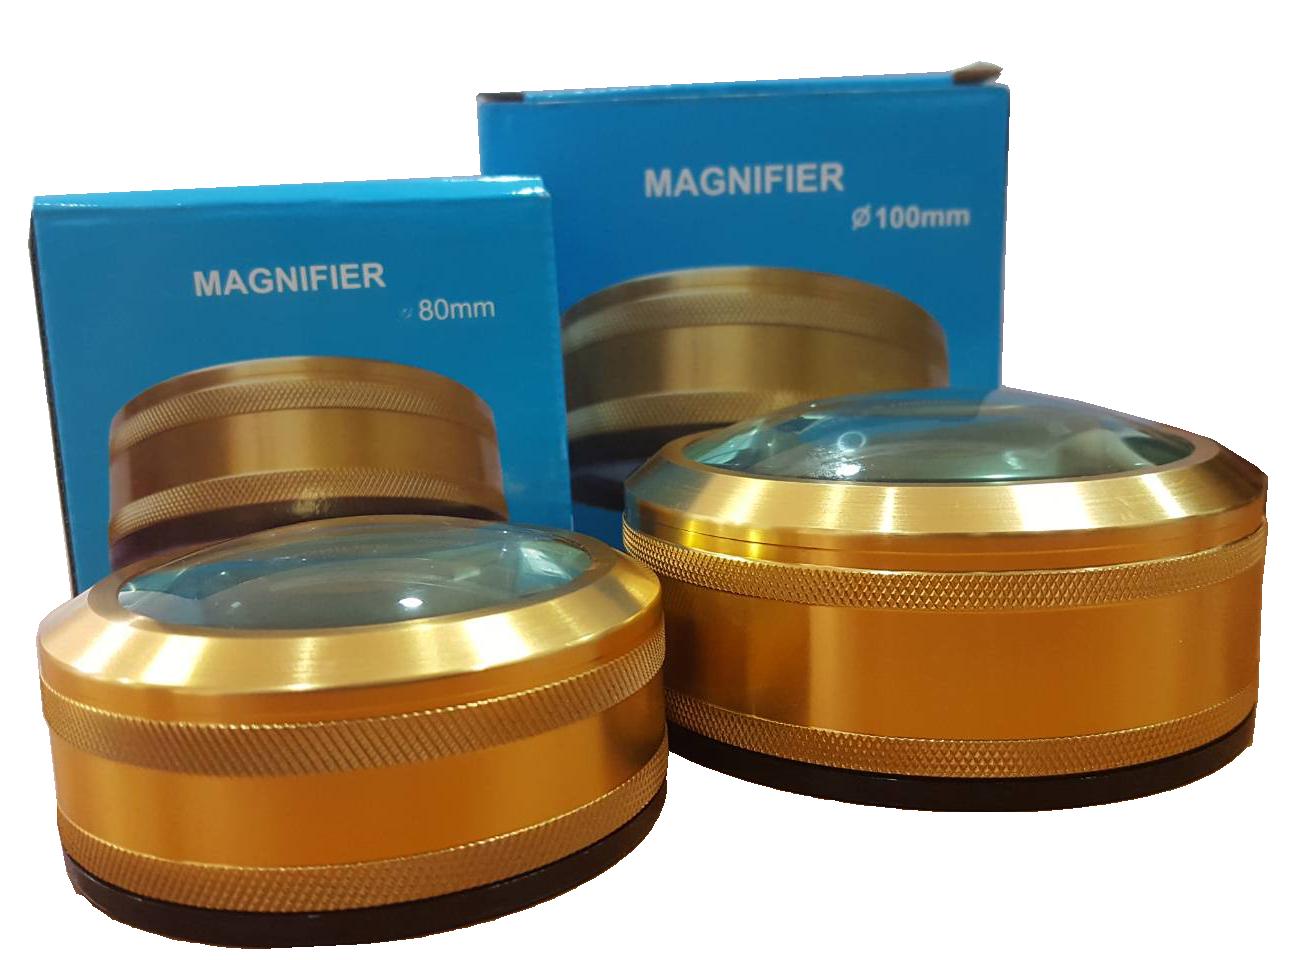 Magnifier,โคมไฟแว่นขยาย